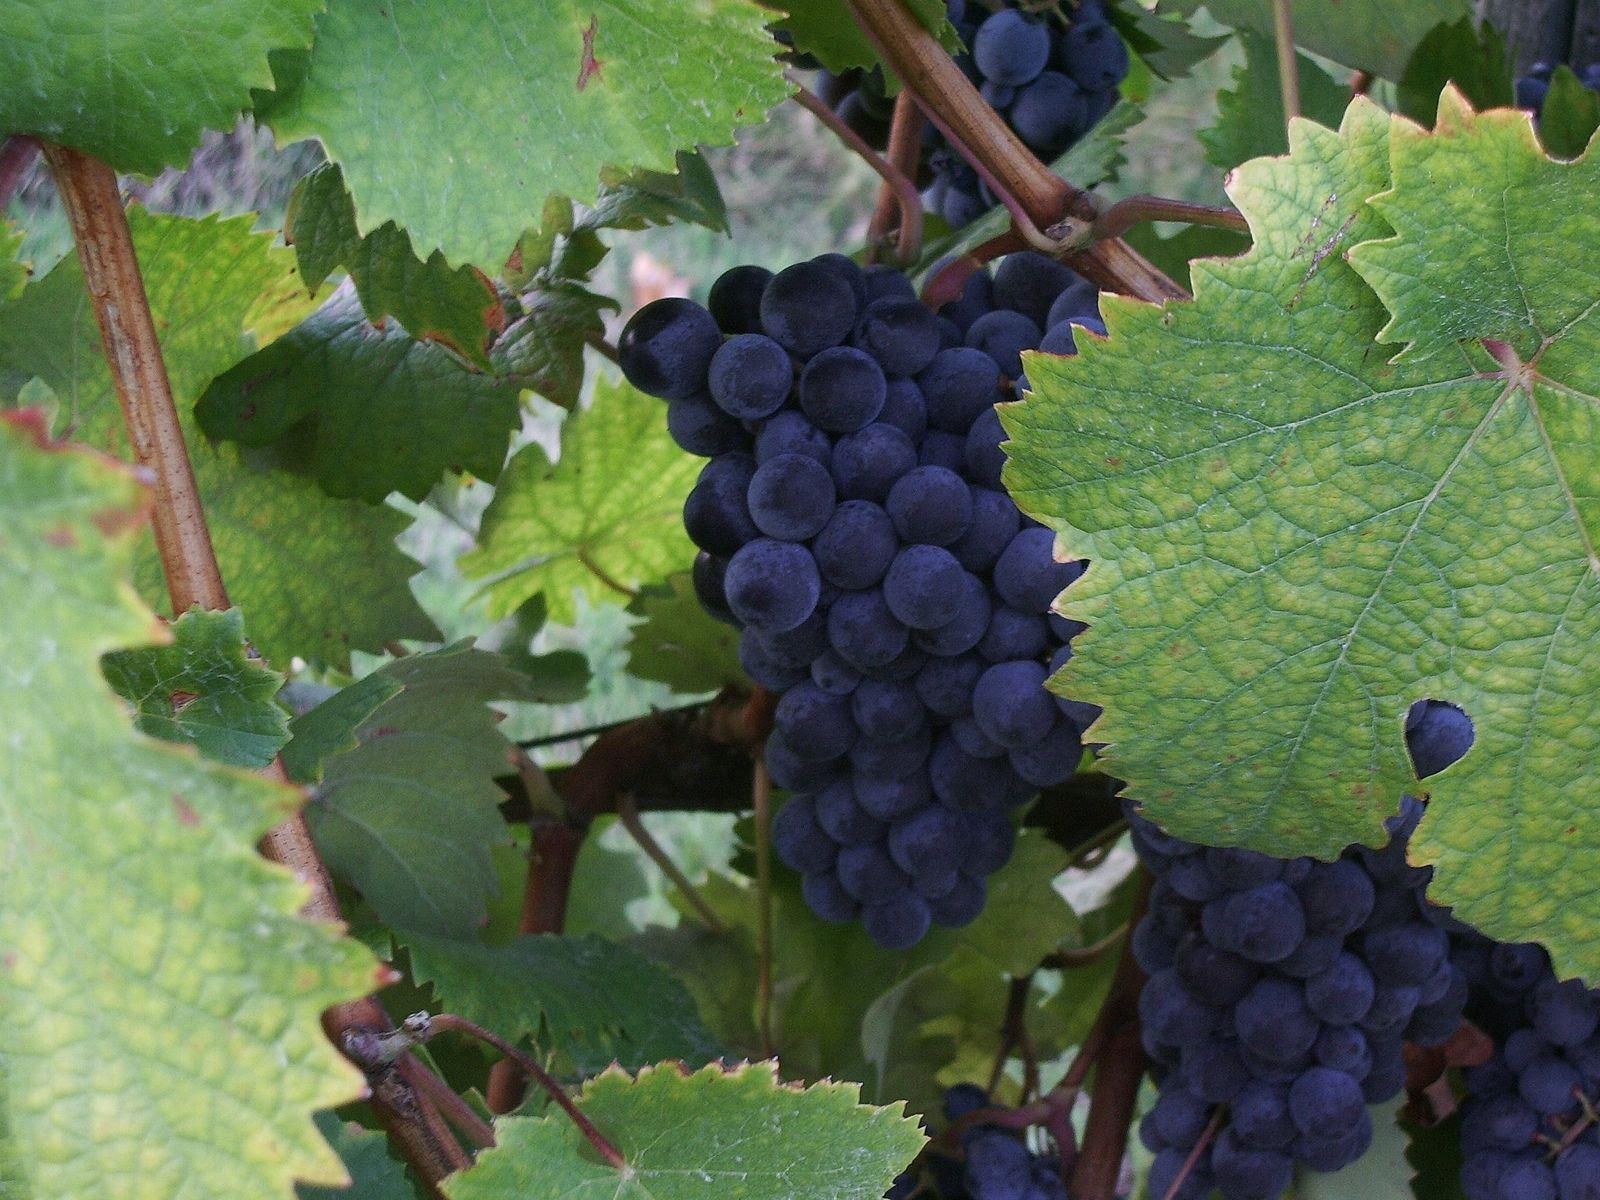 Montecarlo - Harvest time